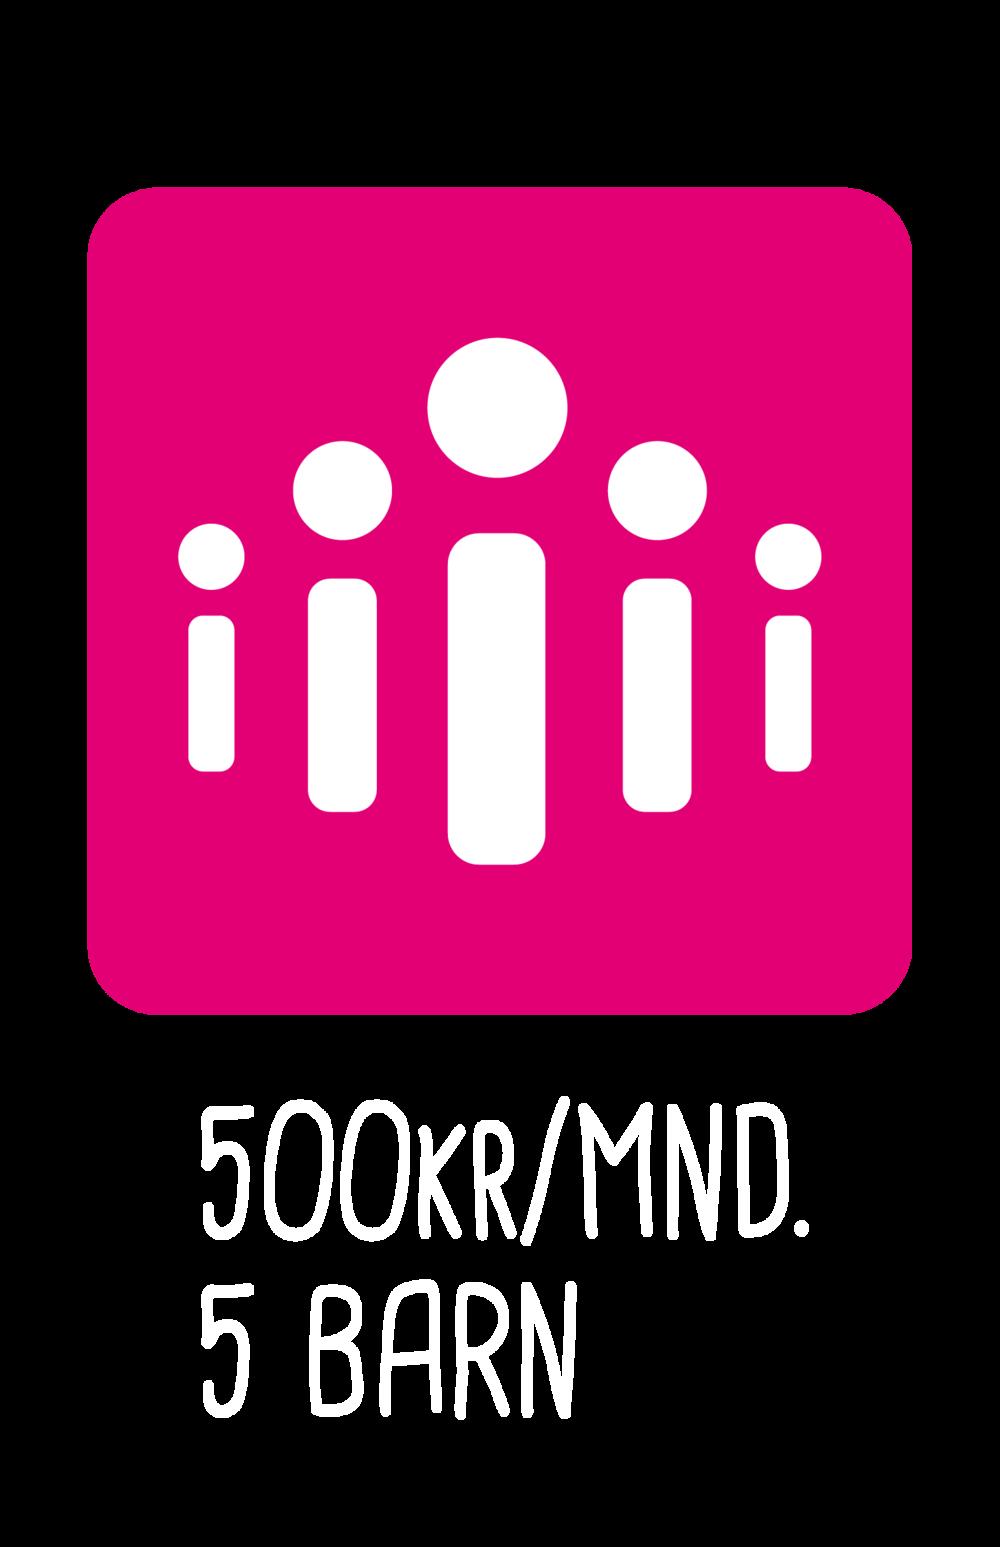 Donate 500KR/MND. 5 Barn